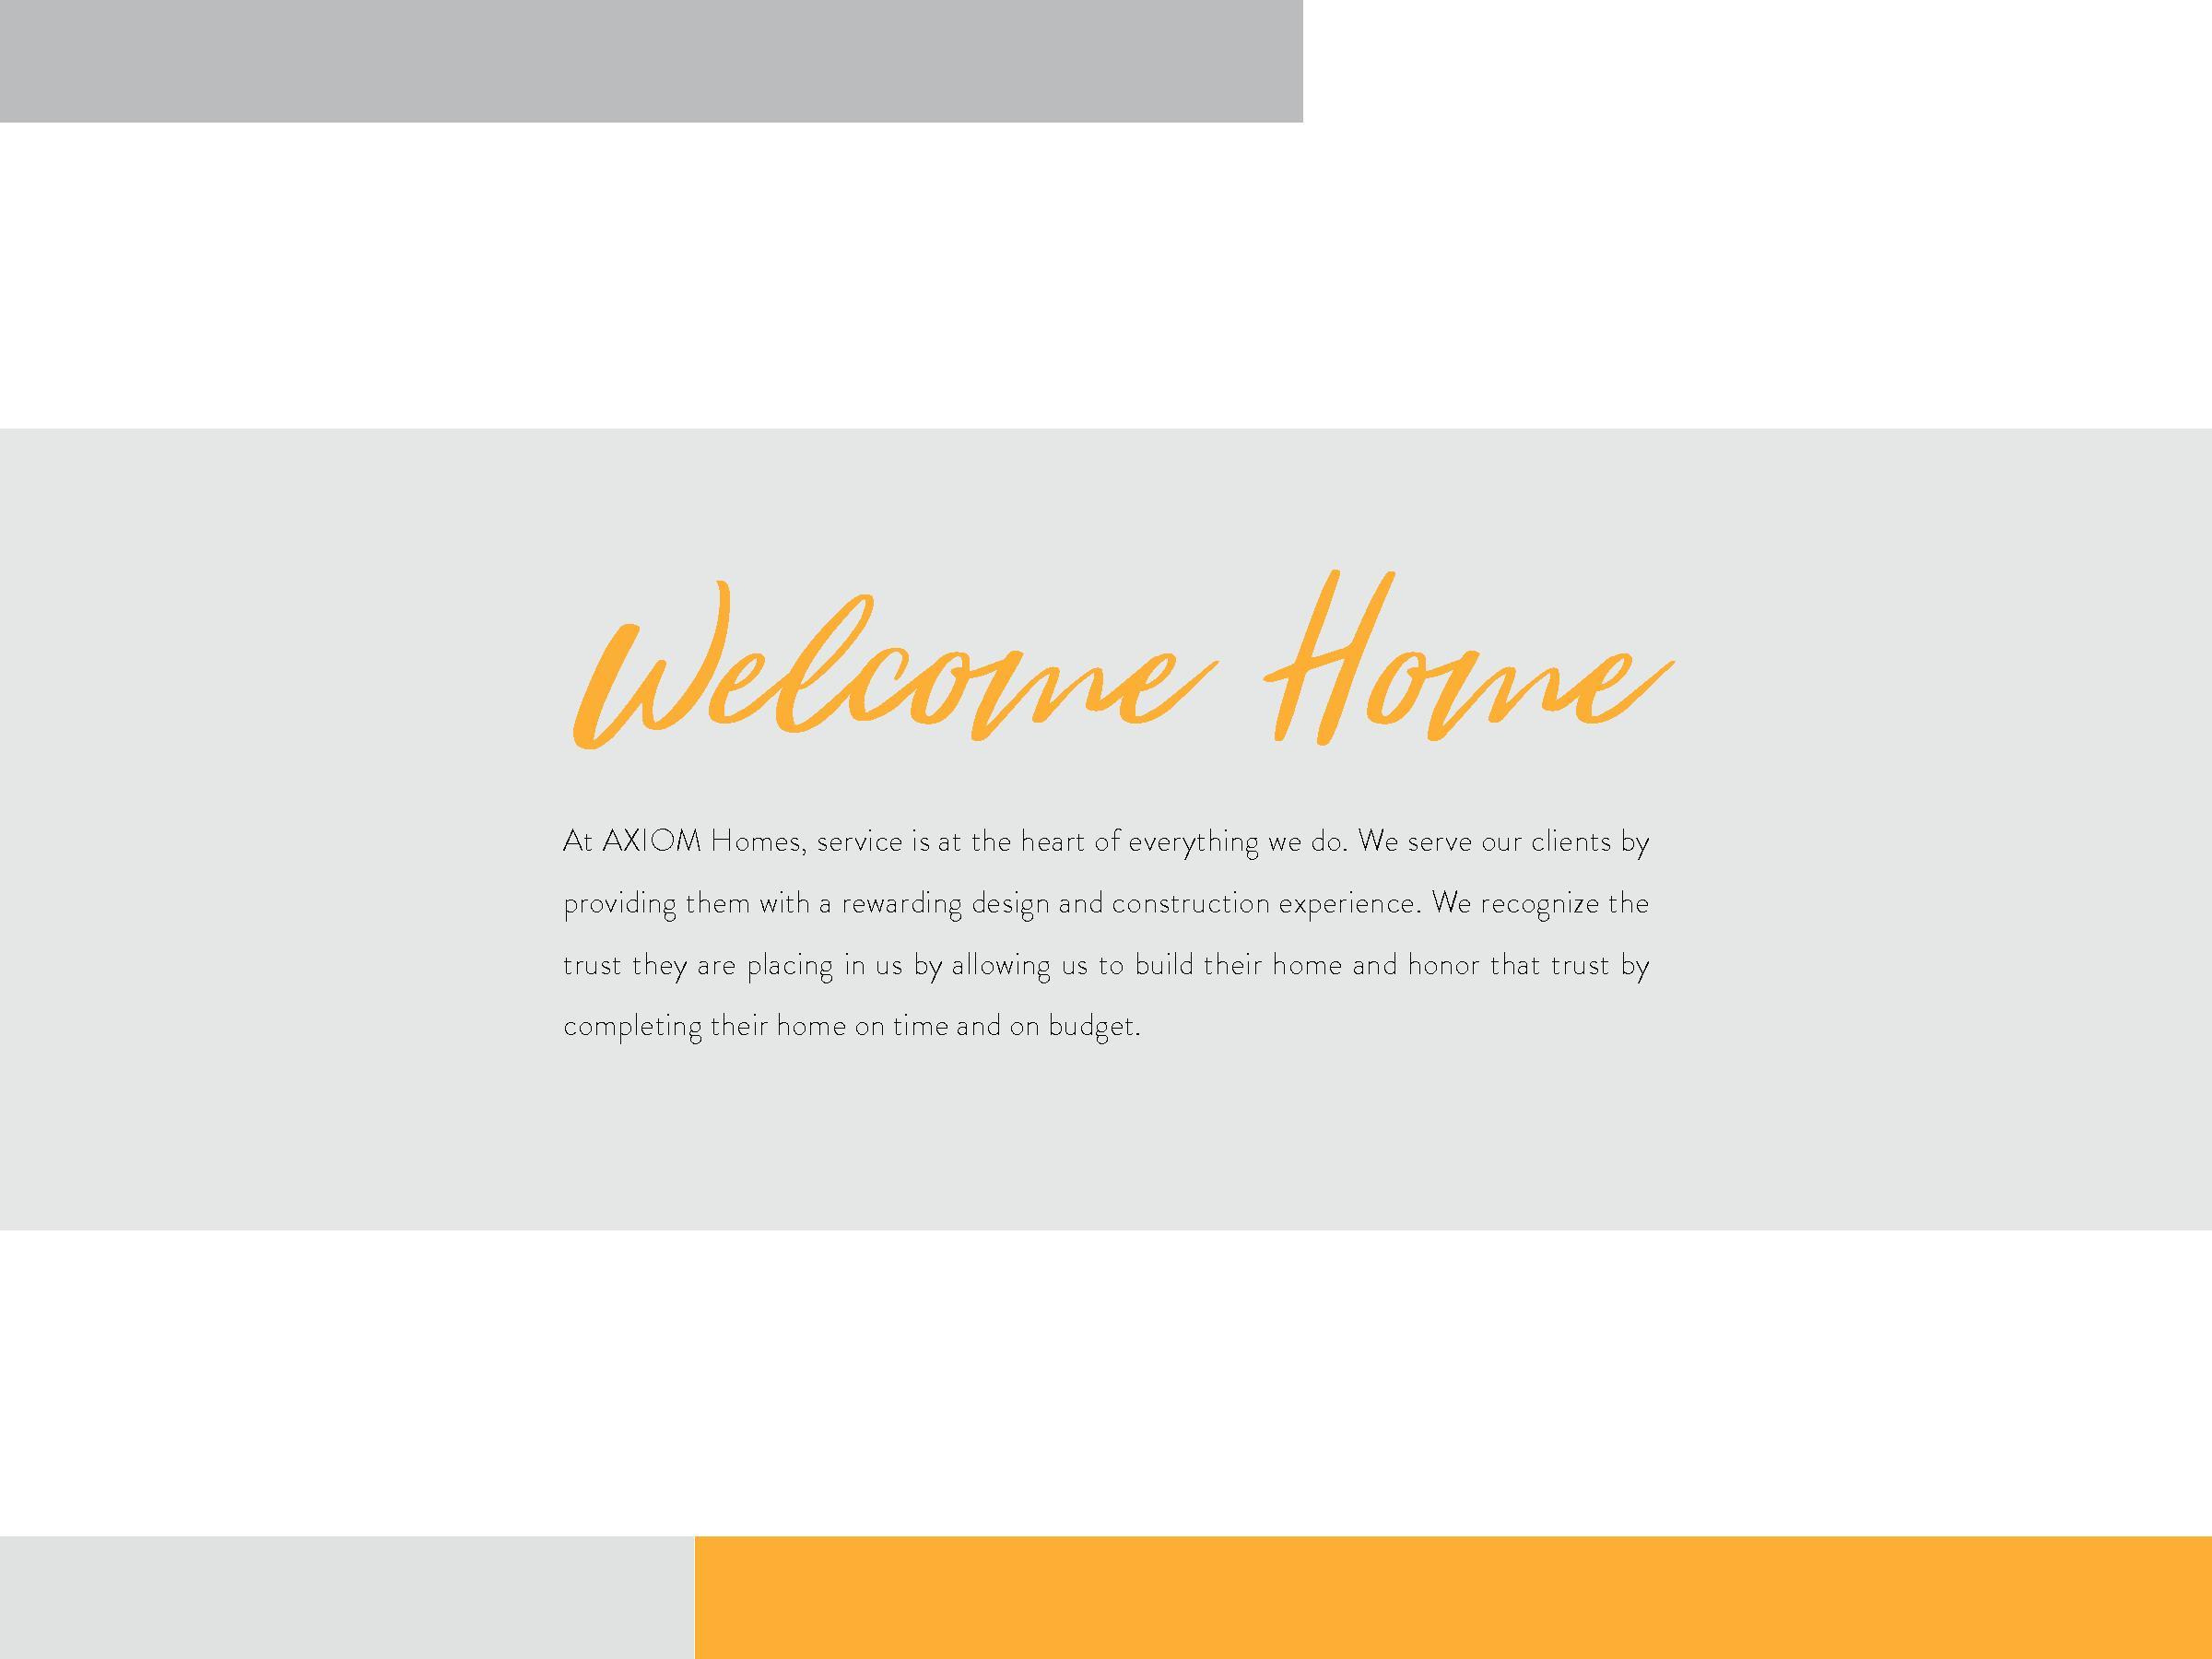 axiom-homes_digital-interactive_id_6.11.18_2.jpg